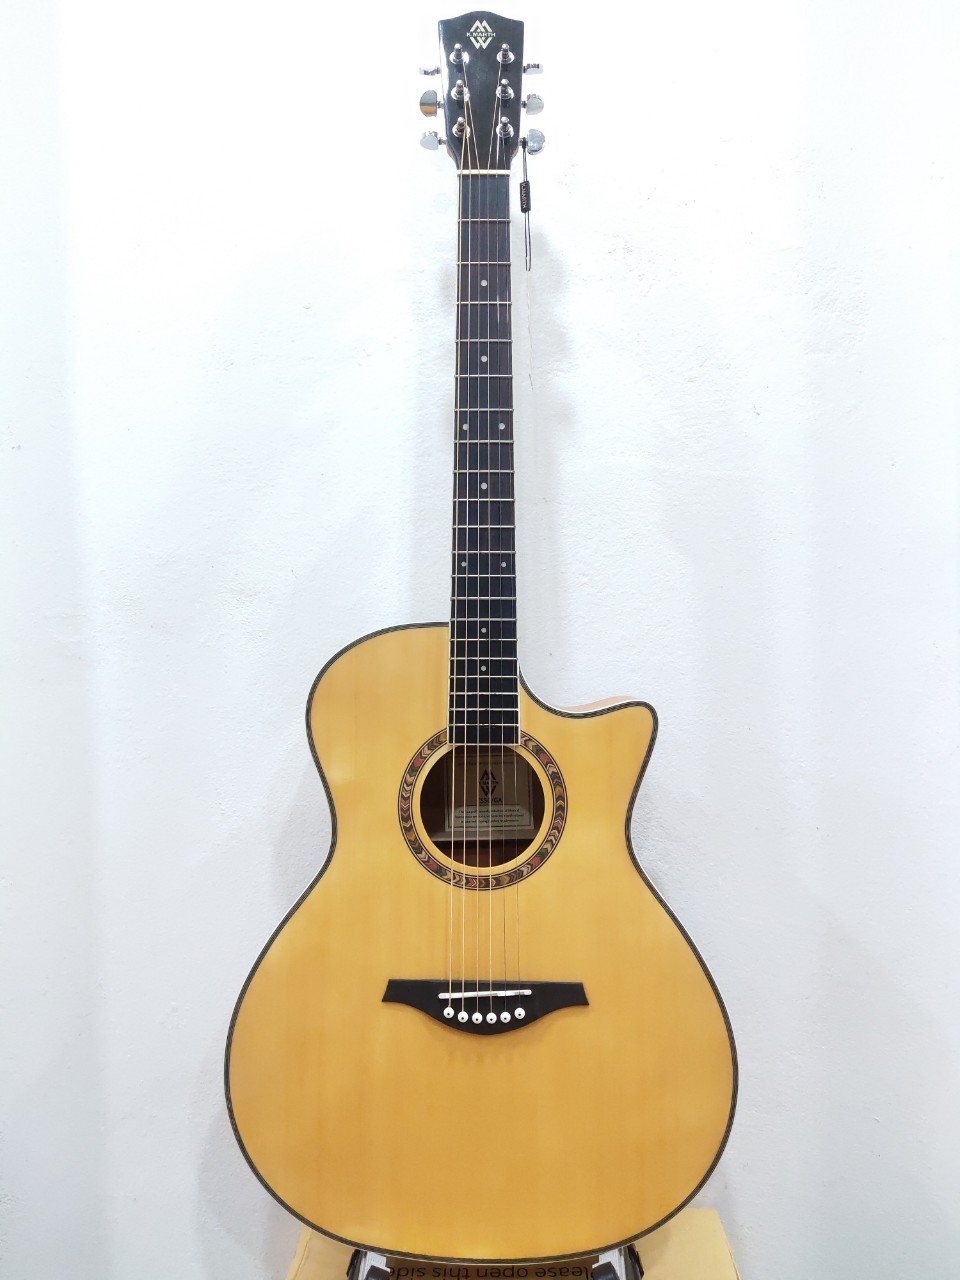 Đàn Guitar Acoustic Marth CS50